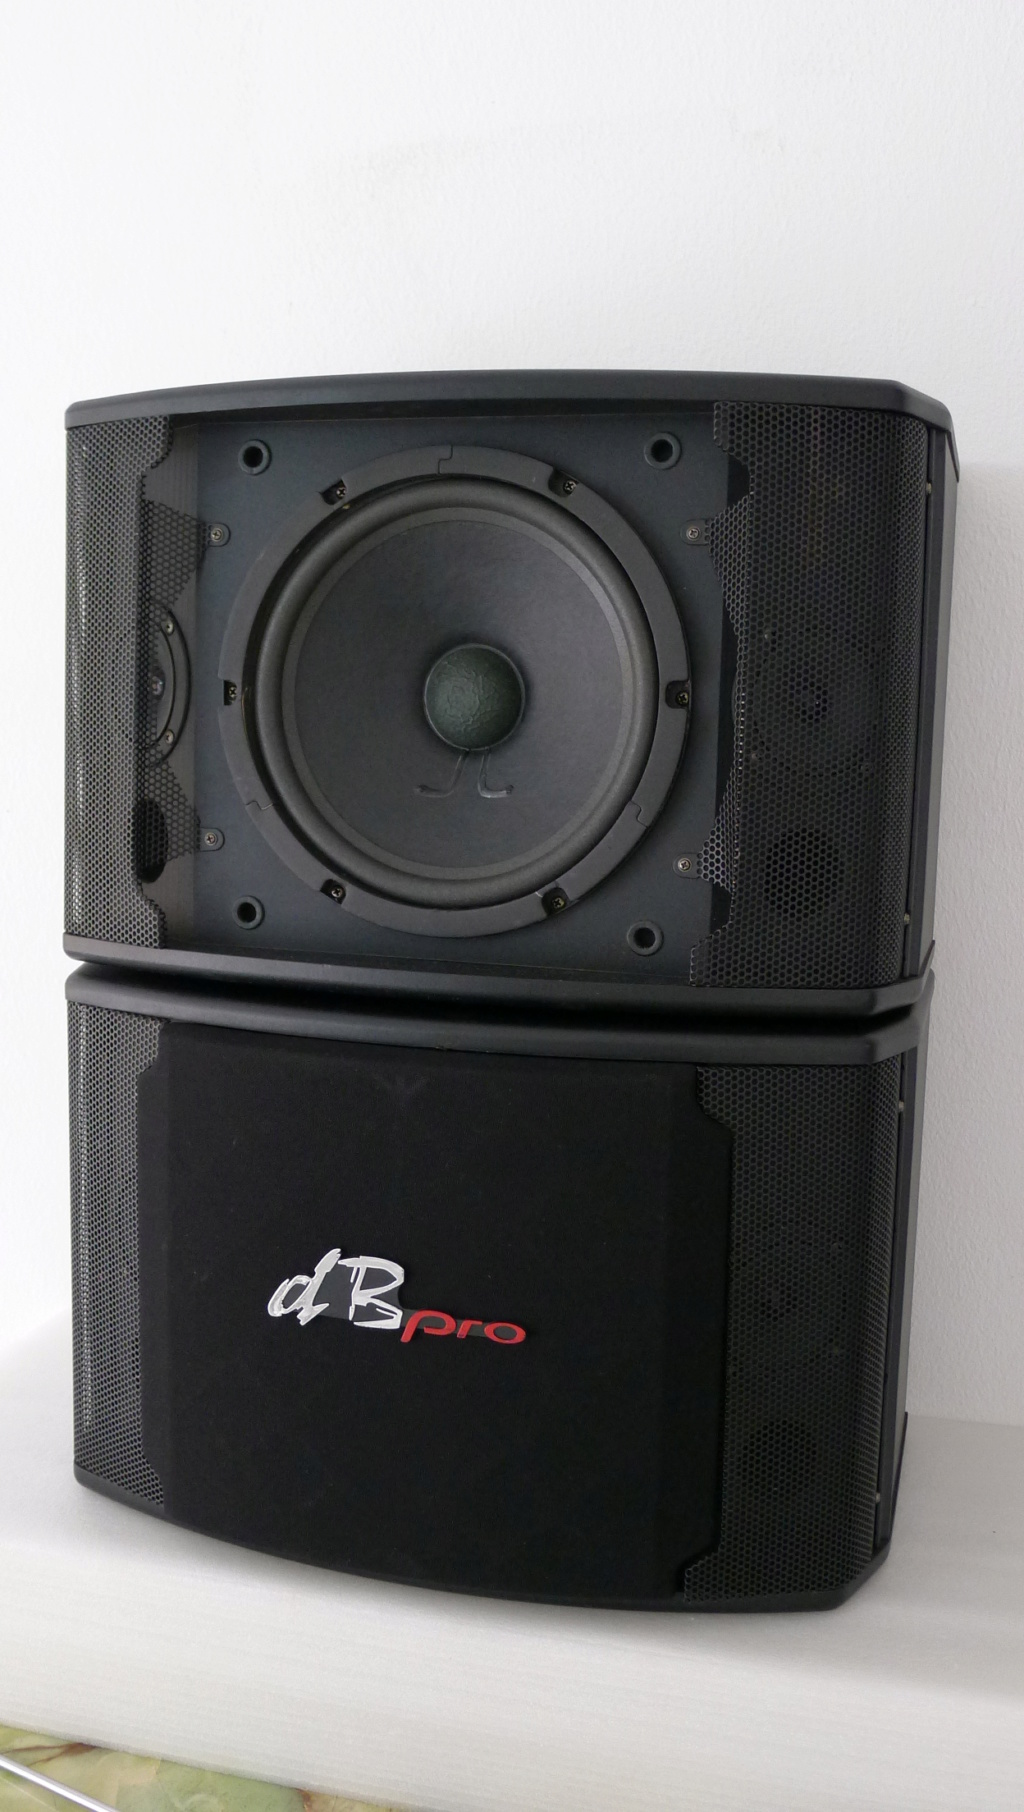 dB Pro Karaoke Speakers (Used) P1150435